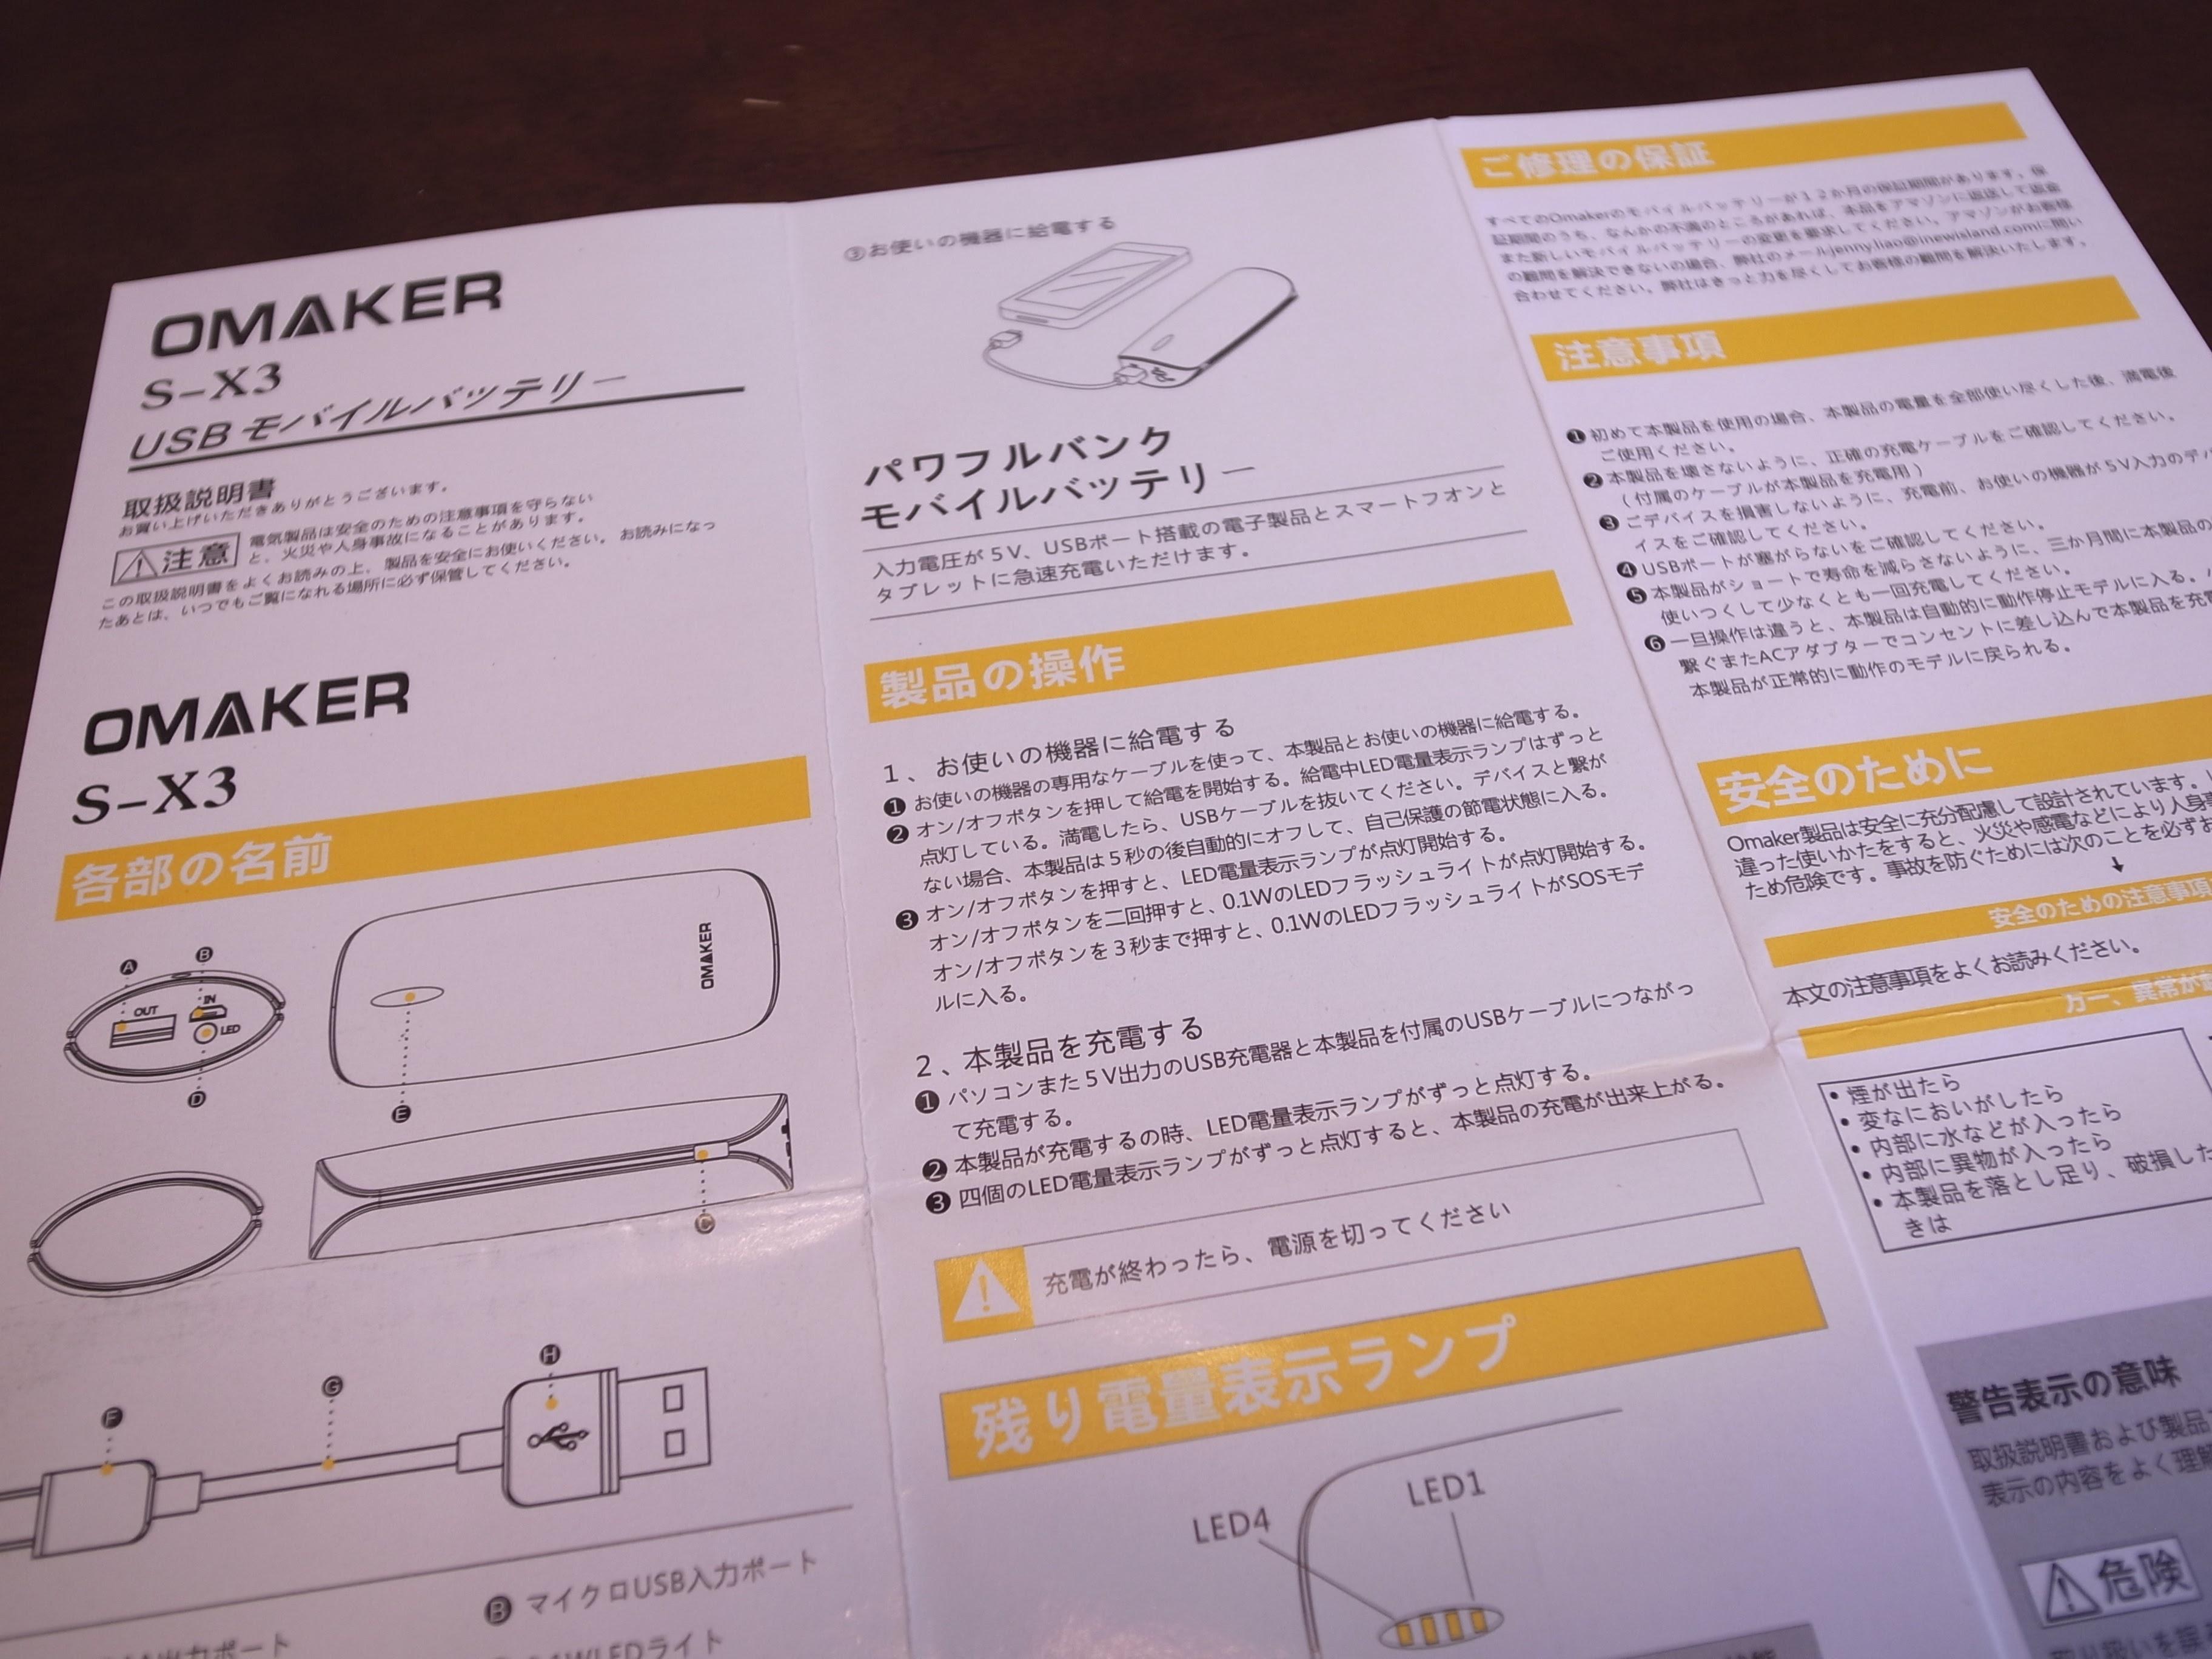 0830-201506_Omaker S-X3 01